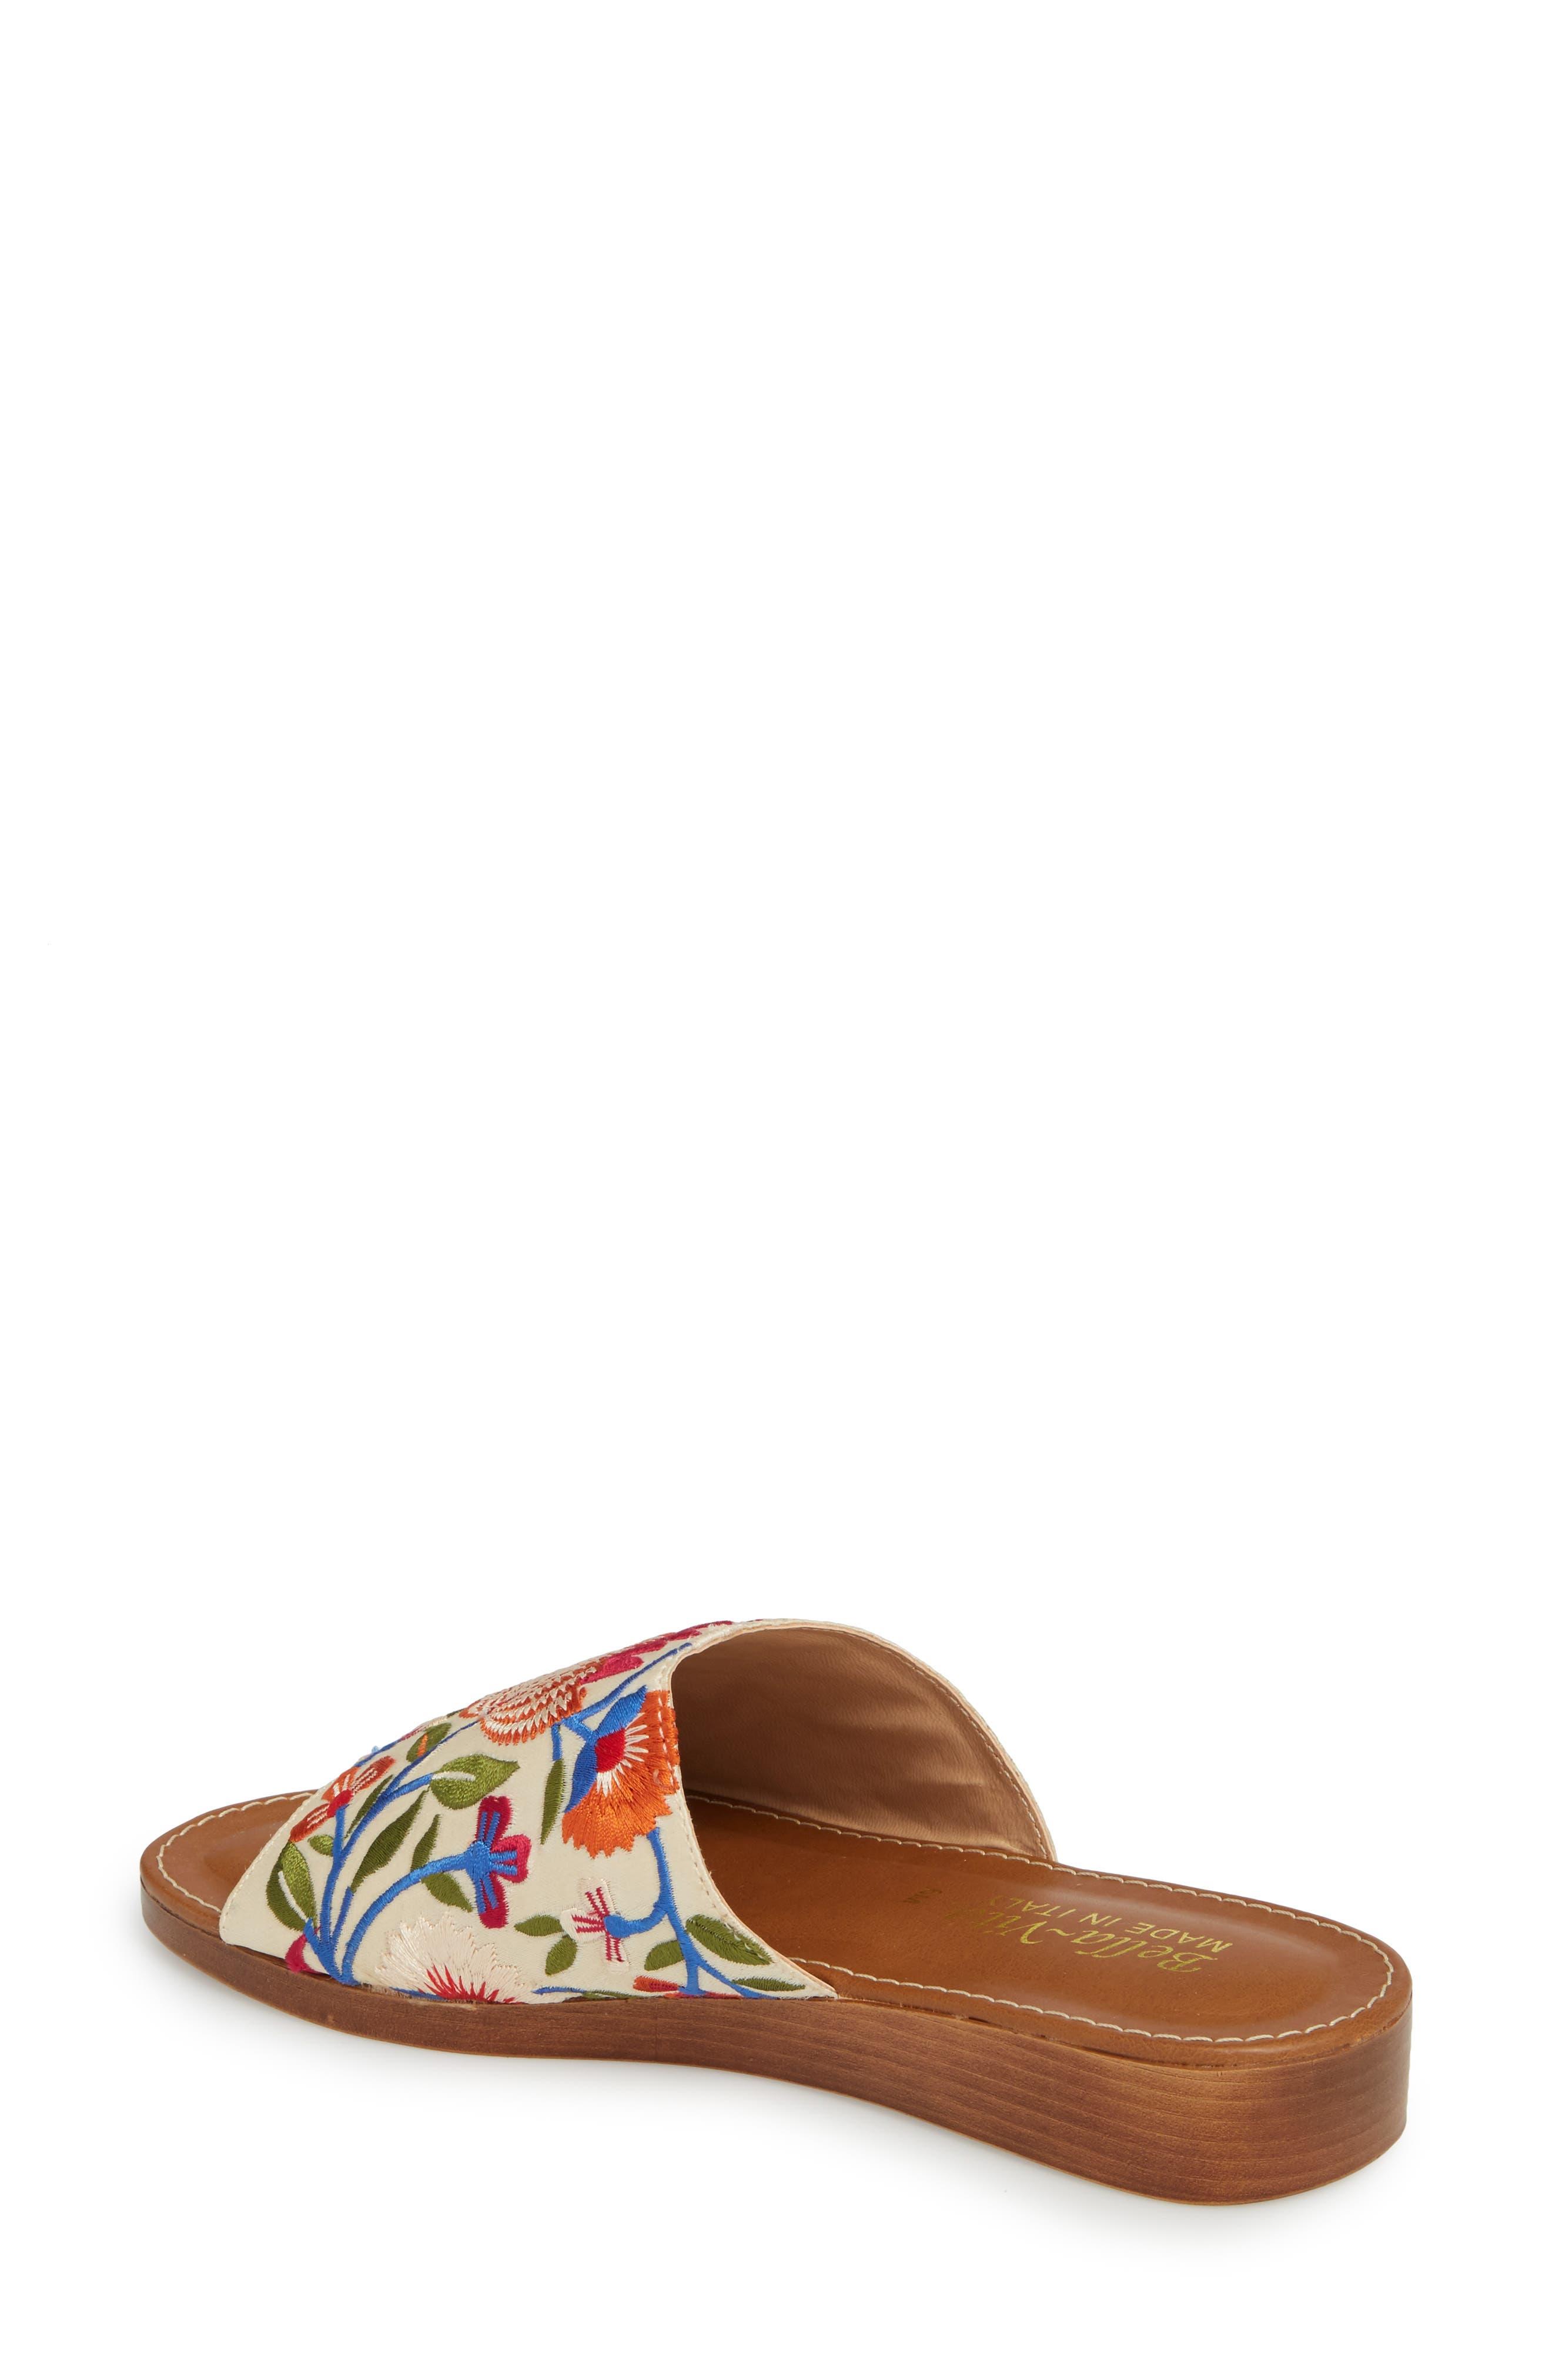 Abi Slide Sandal,                             Alternate thumbnail 2, color,                             Beige Embroidered Fabric